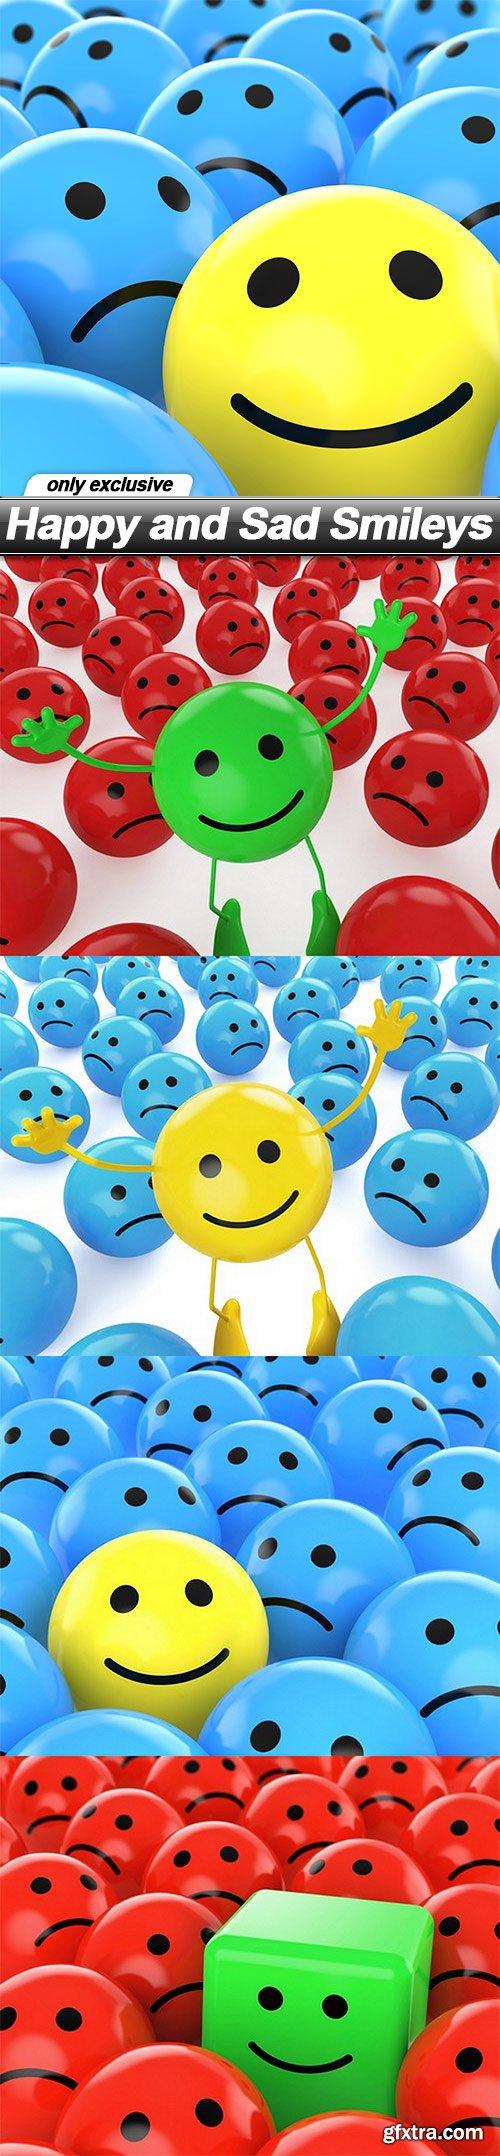 Happy and Sad Smileys - 5 UHQ JPEG